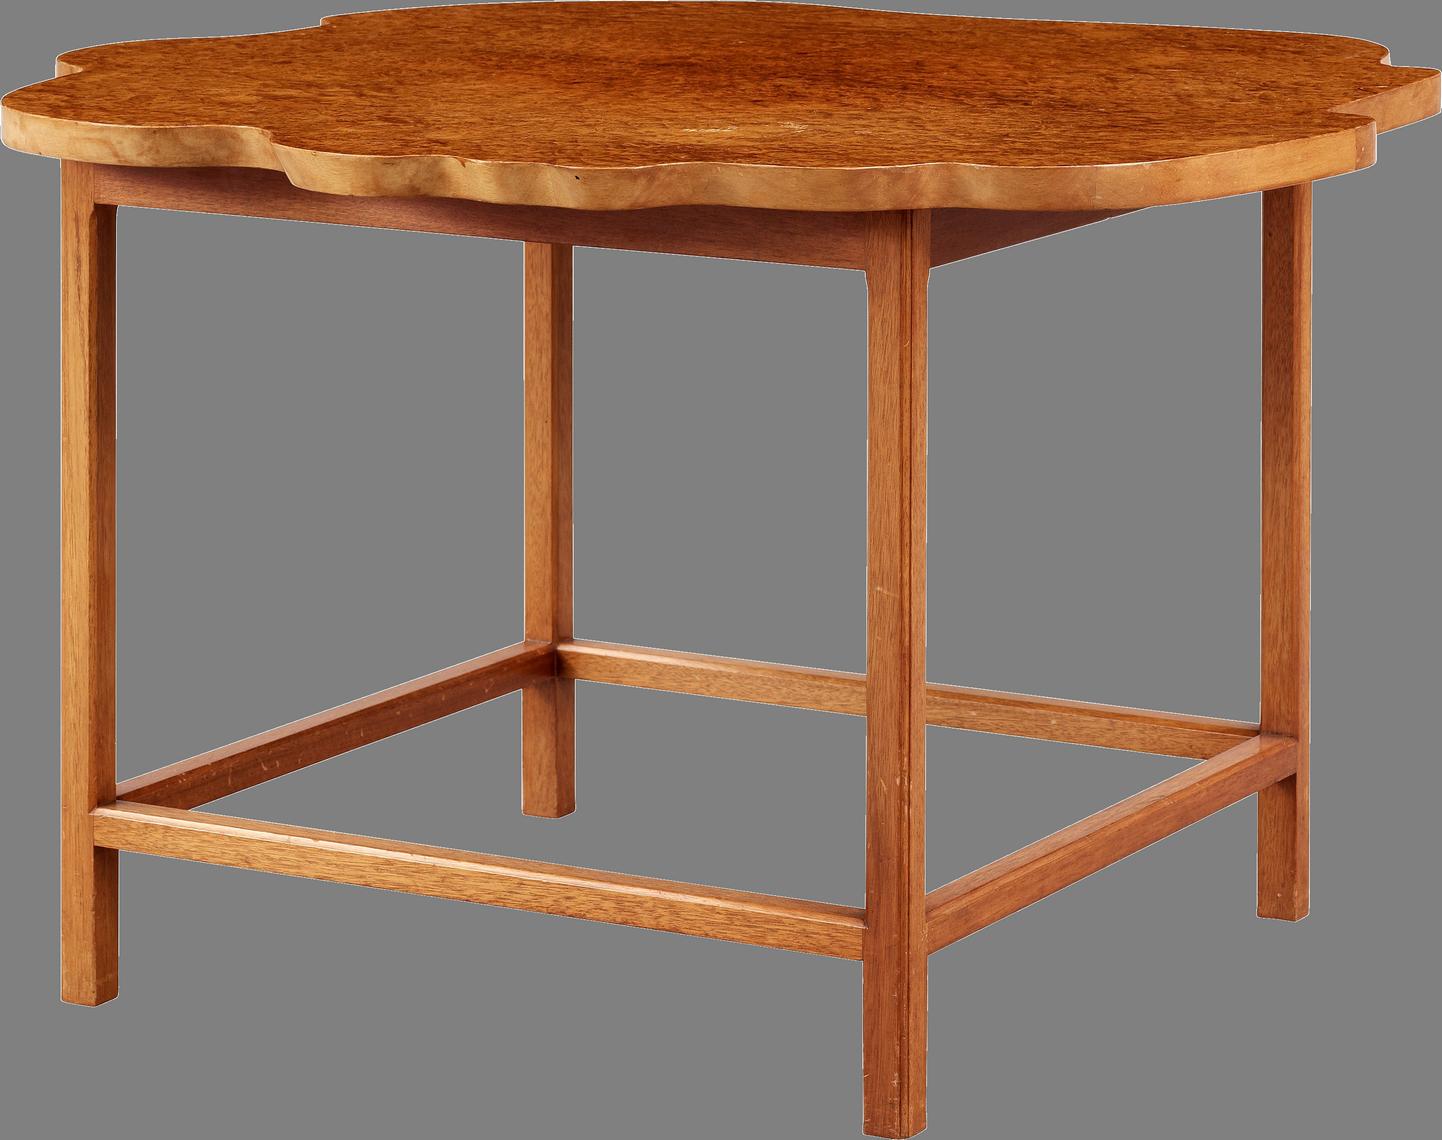 Table png image purepng. Desk clipart transparent background